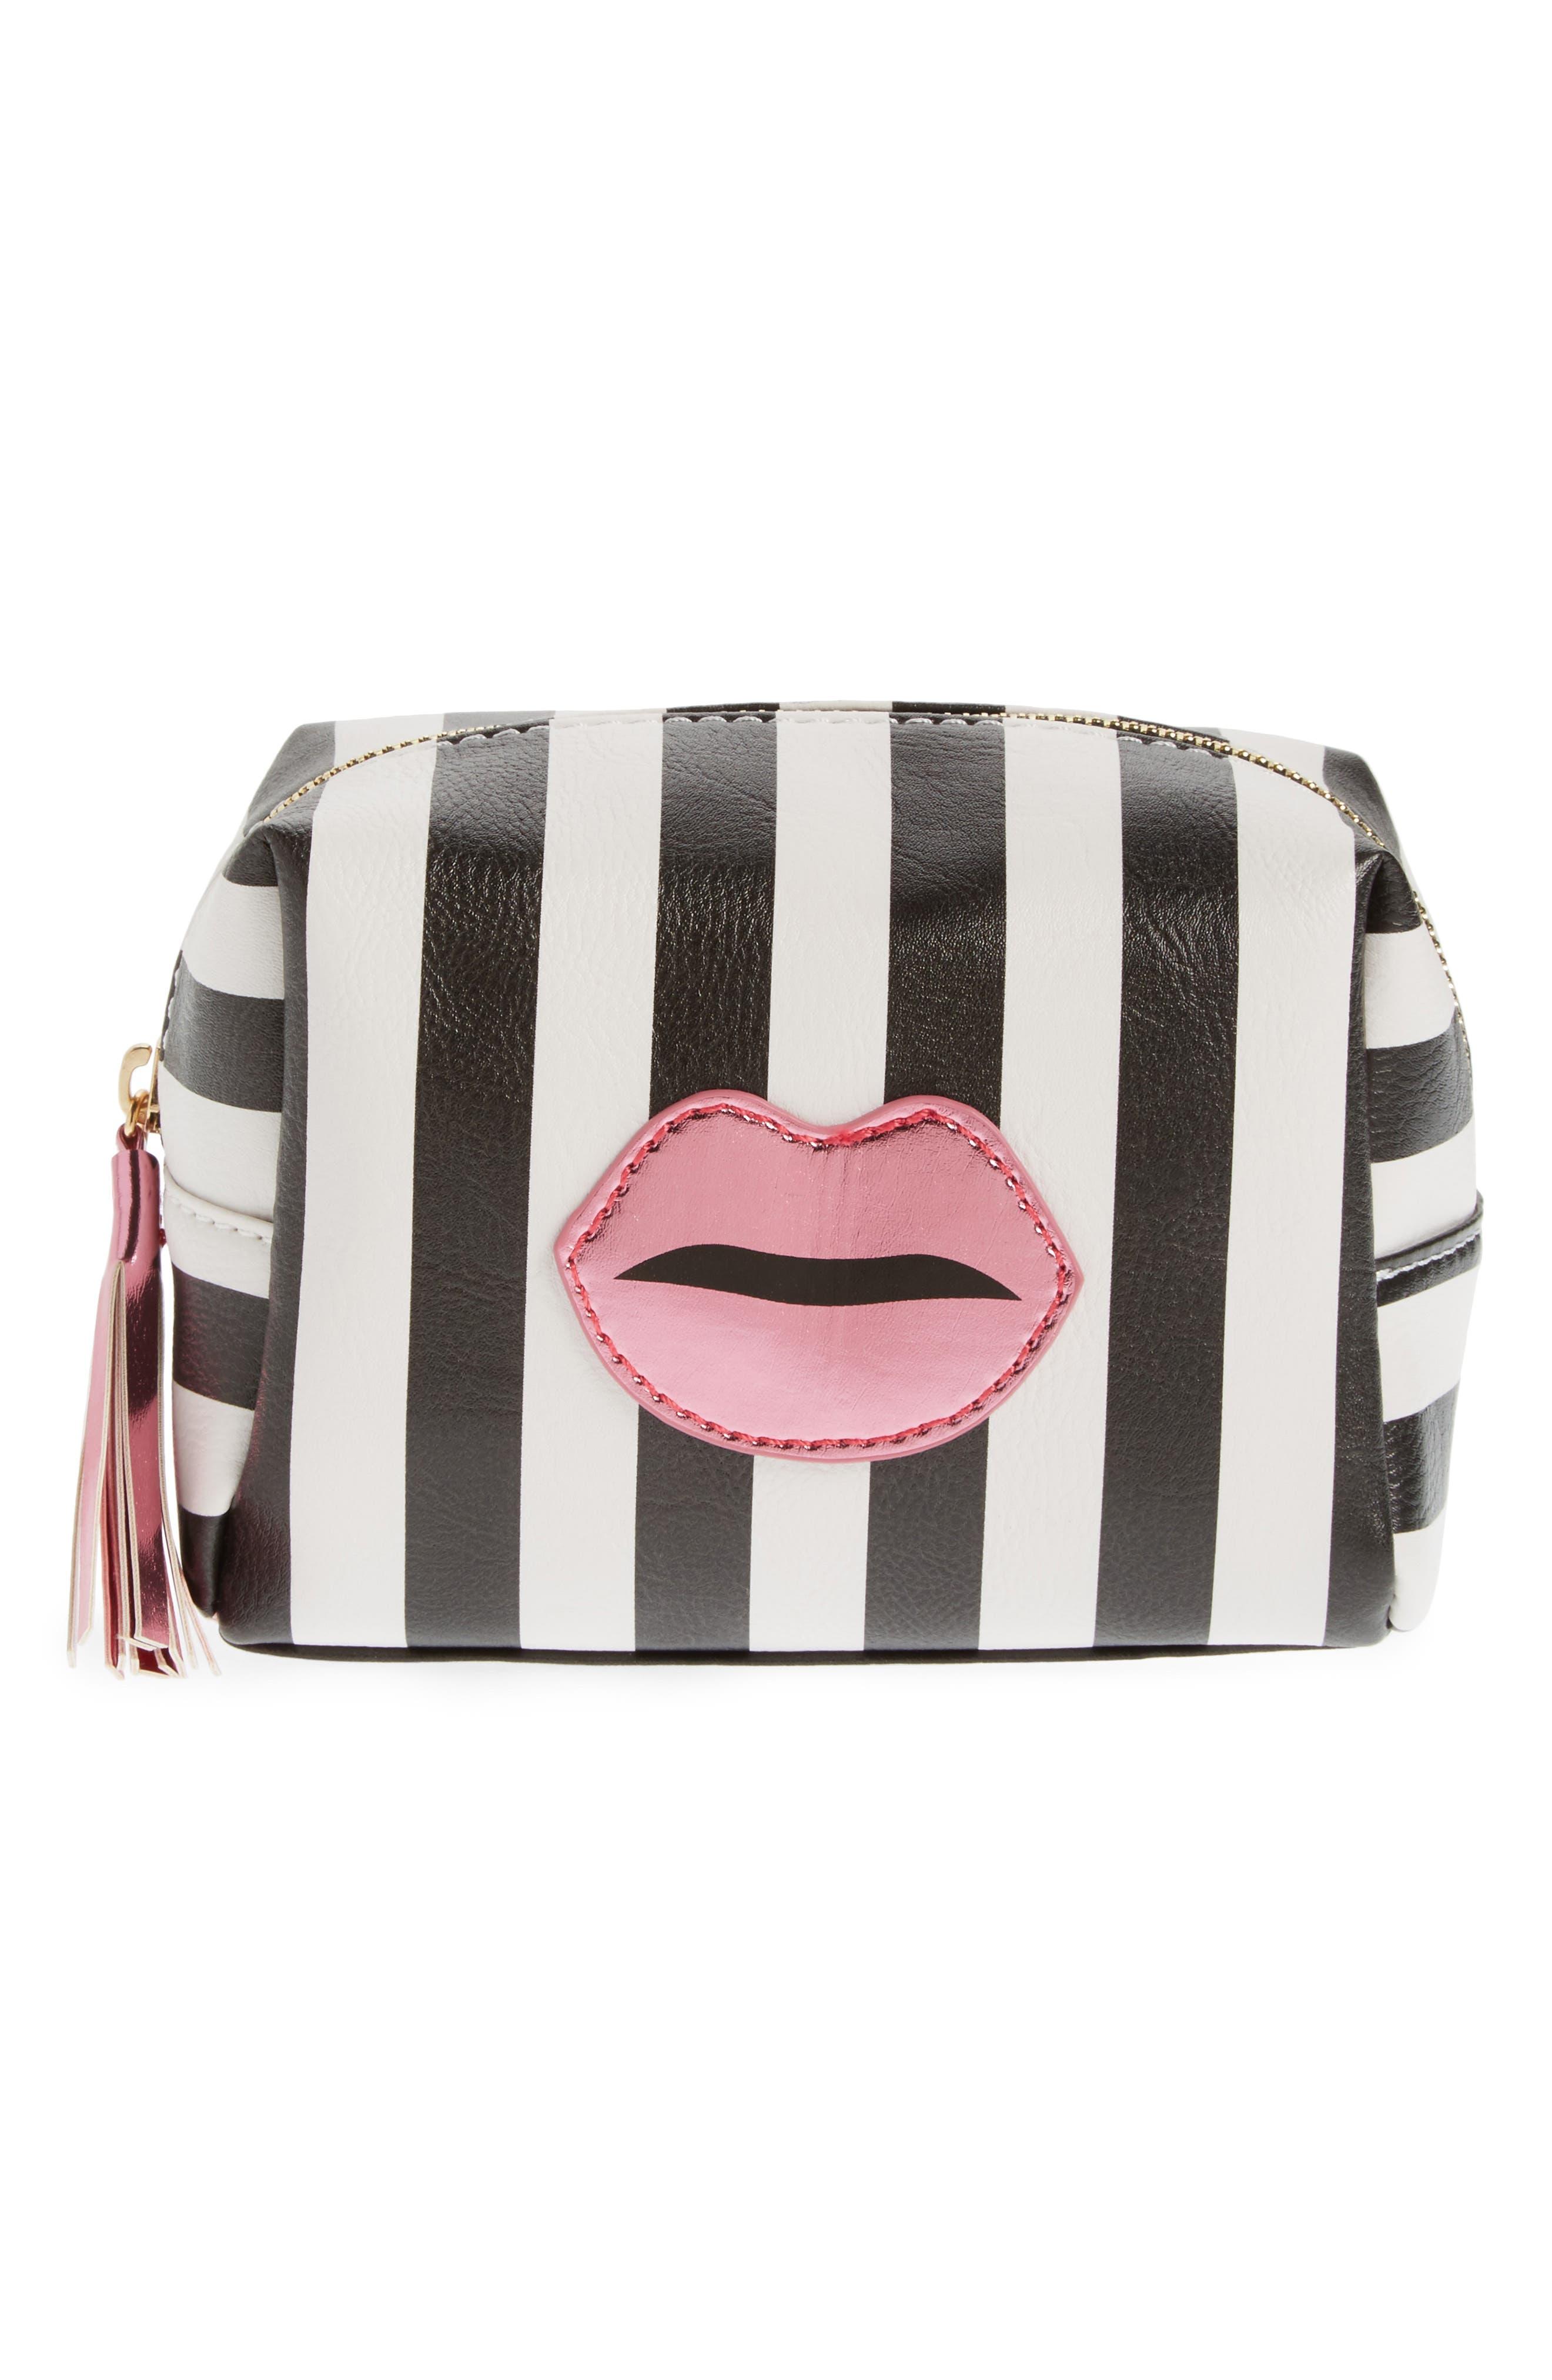 Metallic Lip Stripe Cosmetics Bag,                         Main,                         color, Black/ White